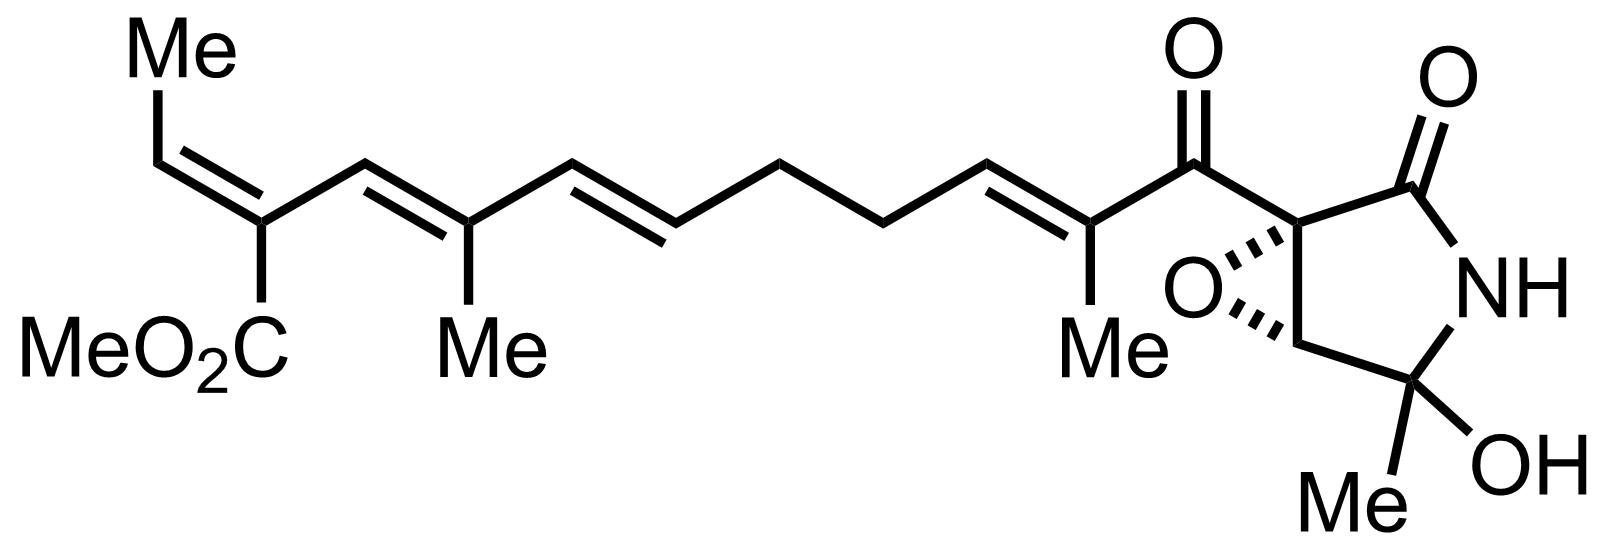 Epolactaene structure